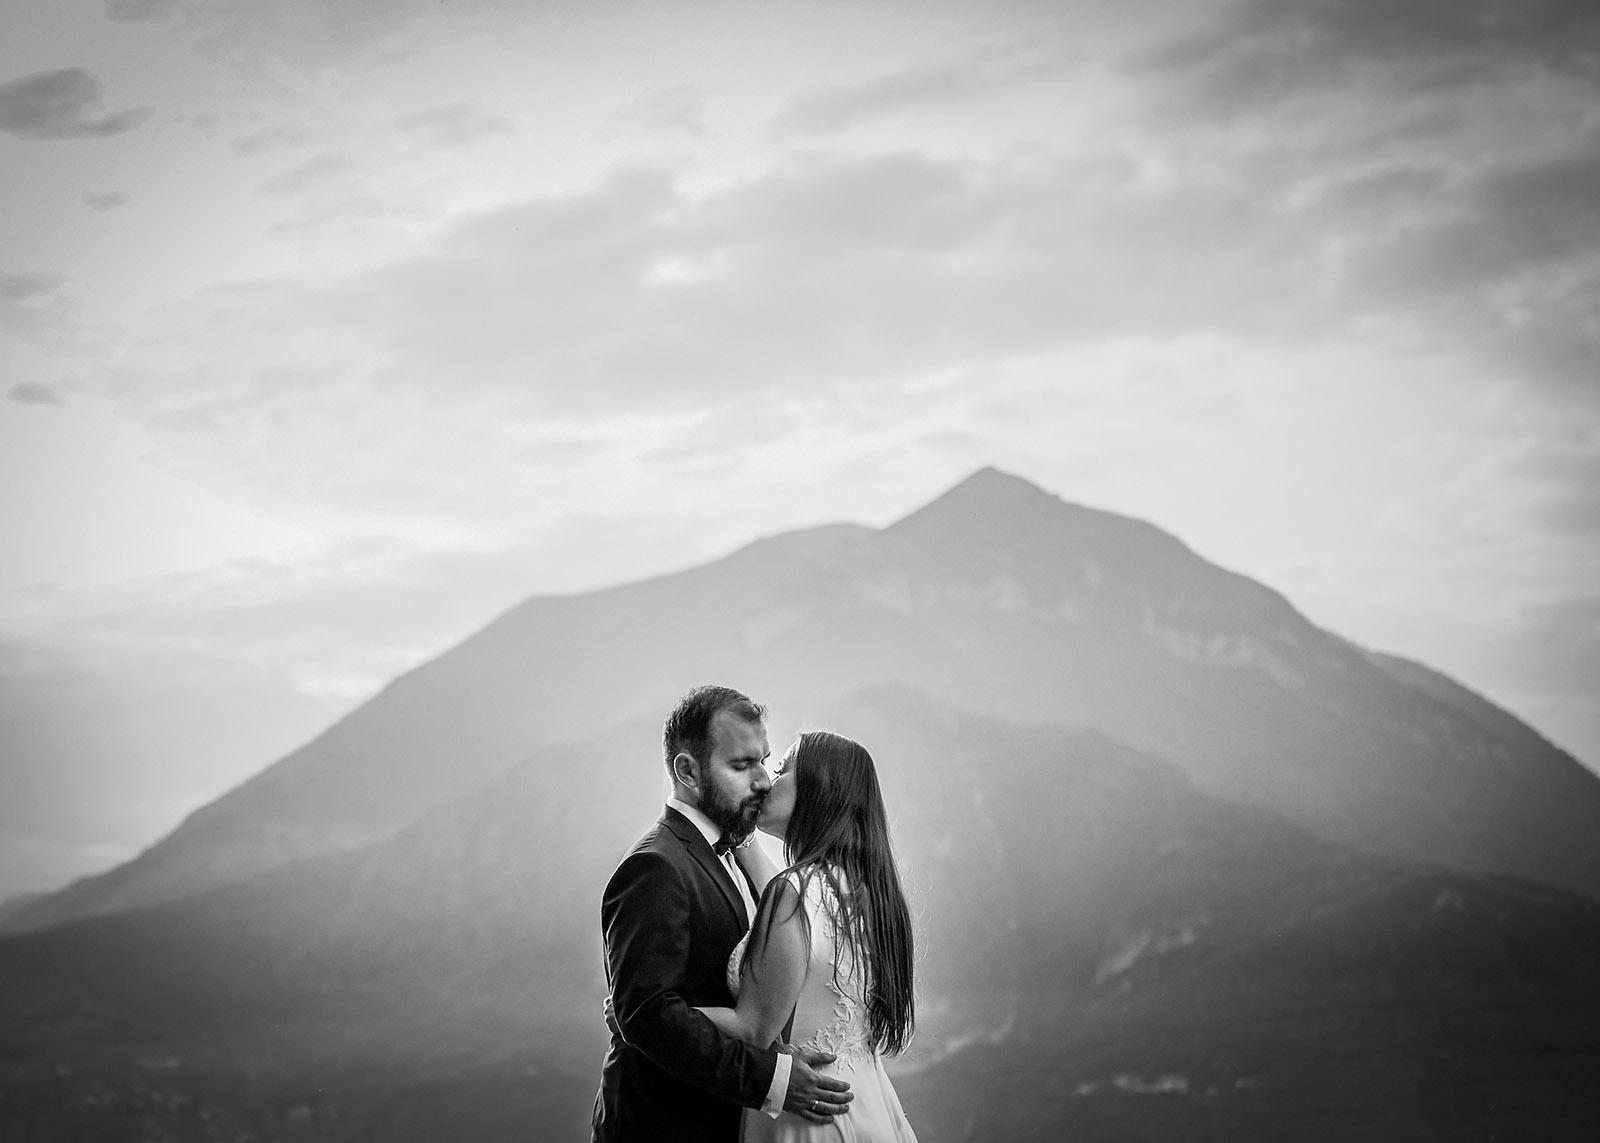 sesja ślubna na tle gór